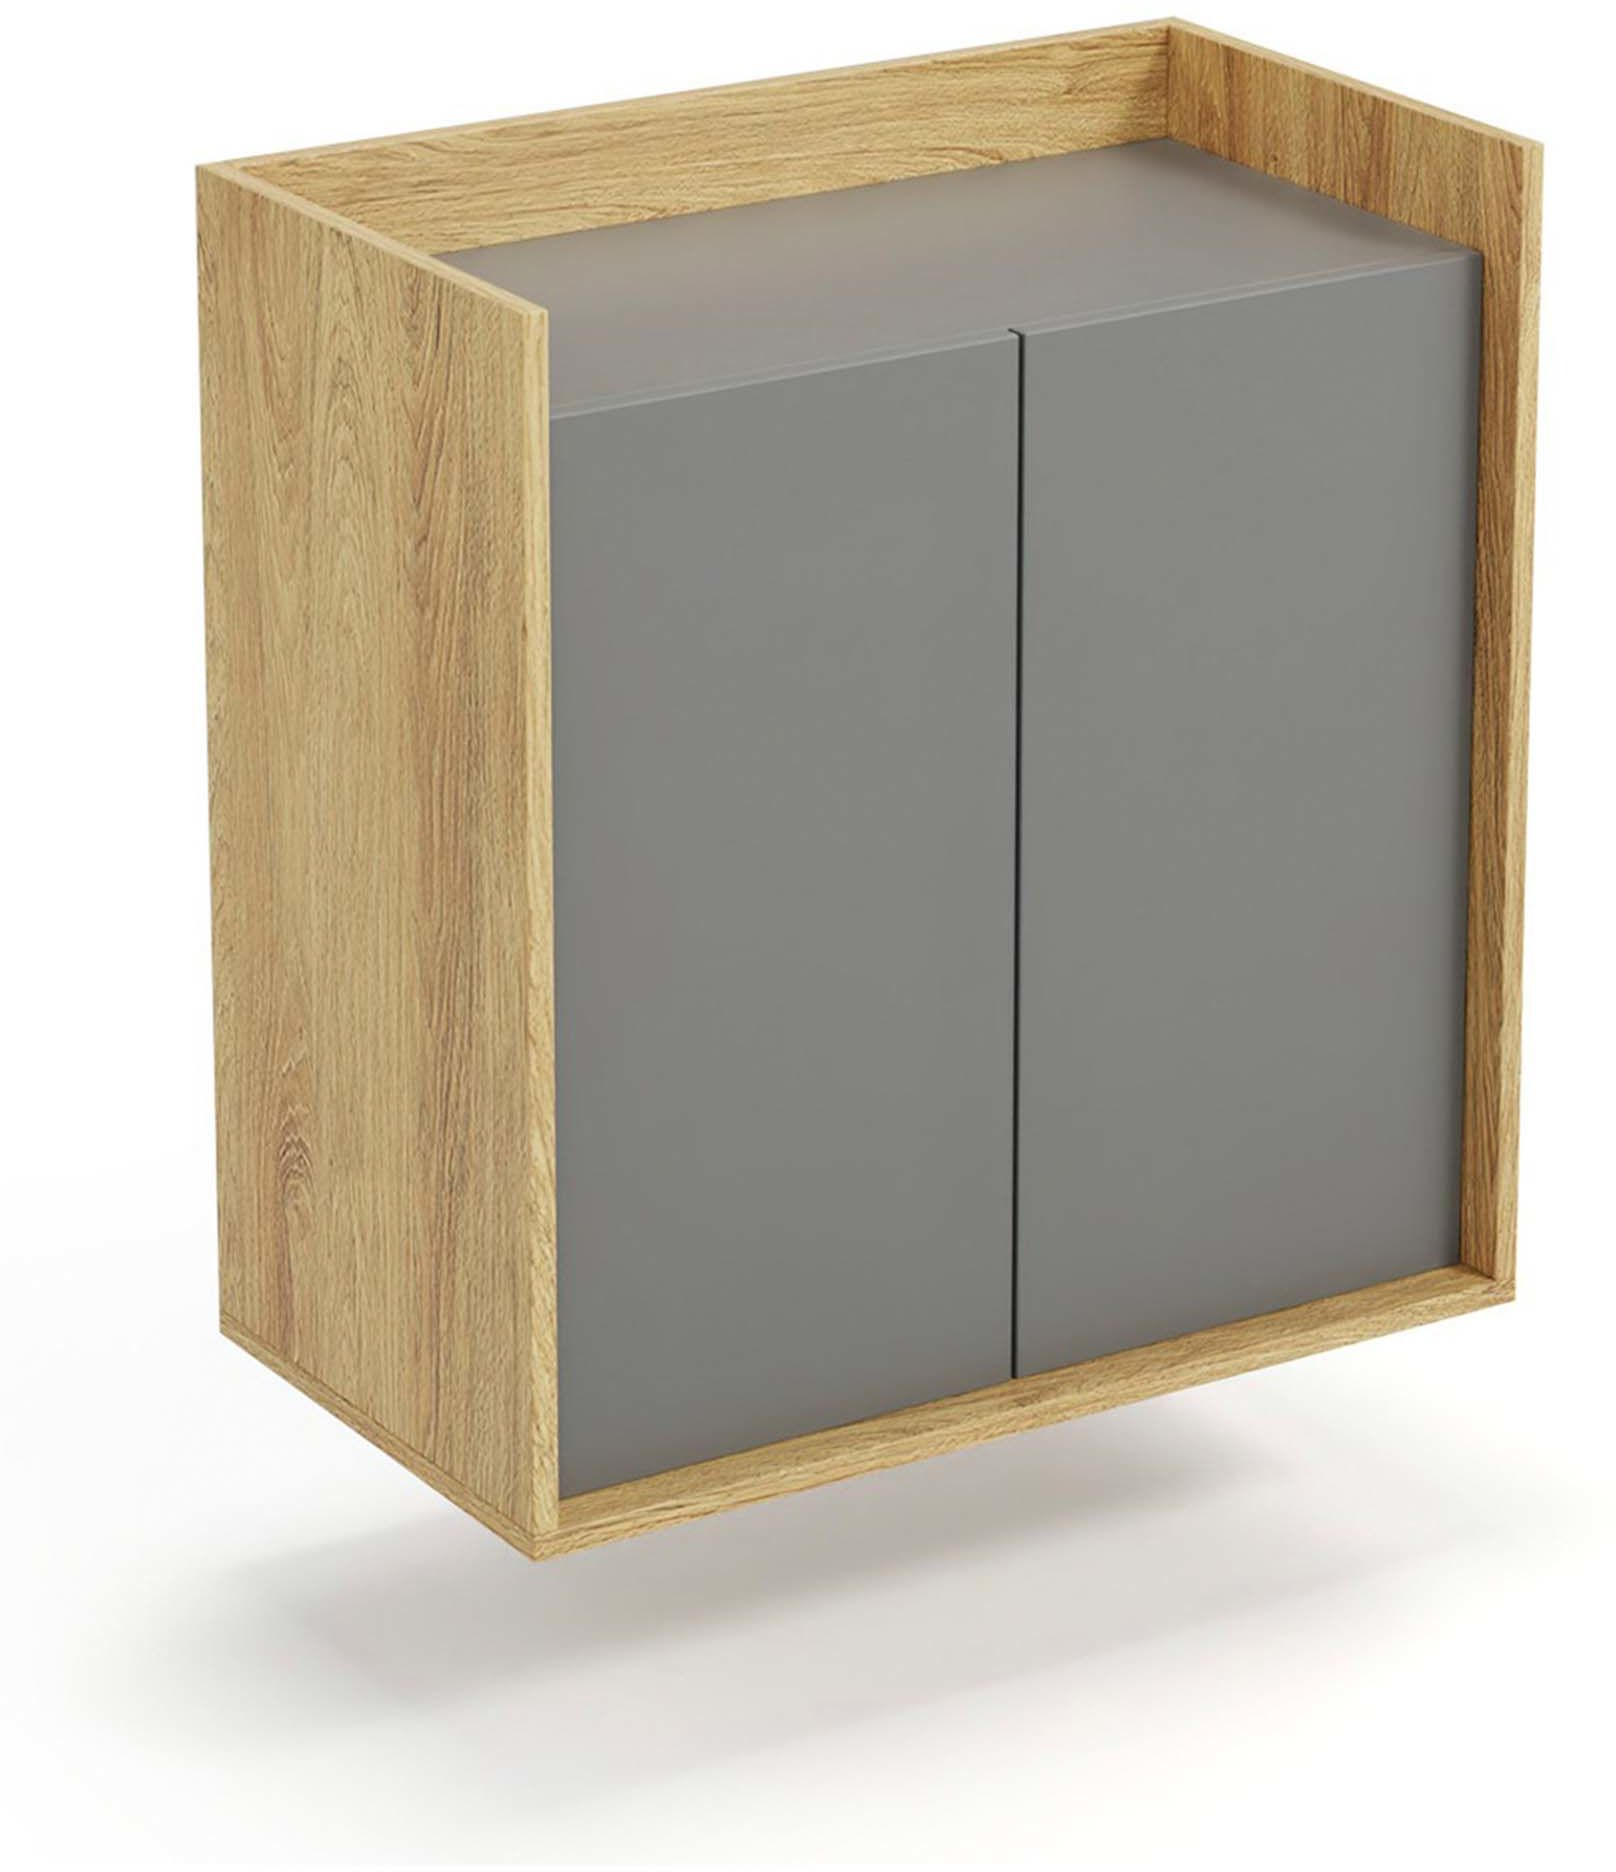 Mobius szafka 2D (78x41x83 cm), hikora naturalna, meble modułowe